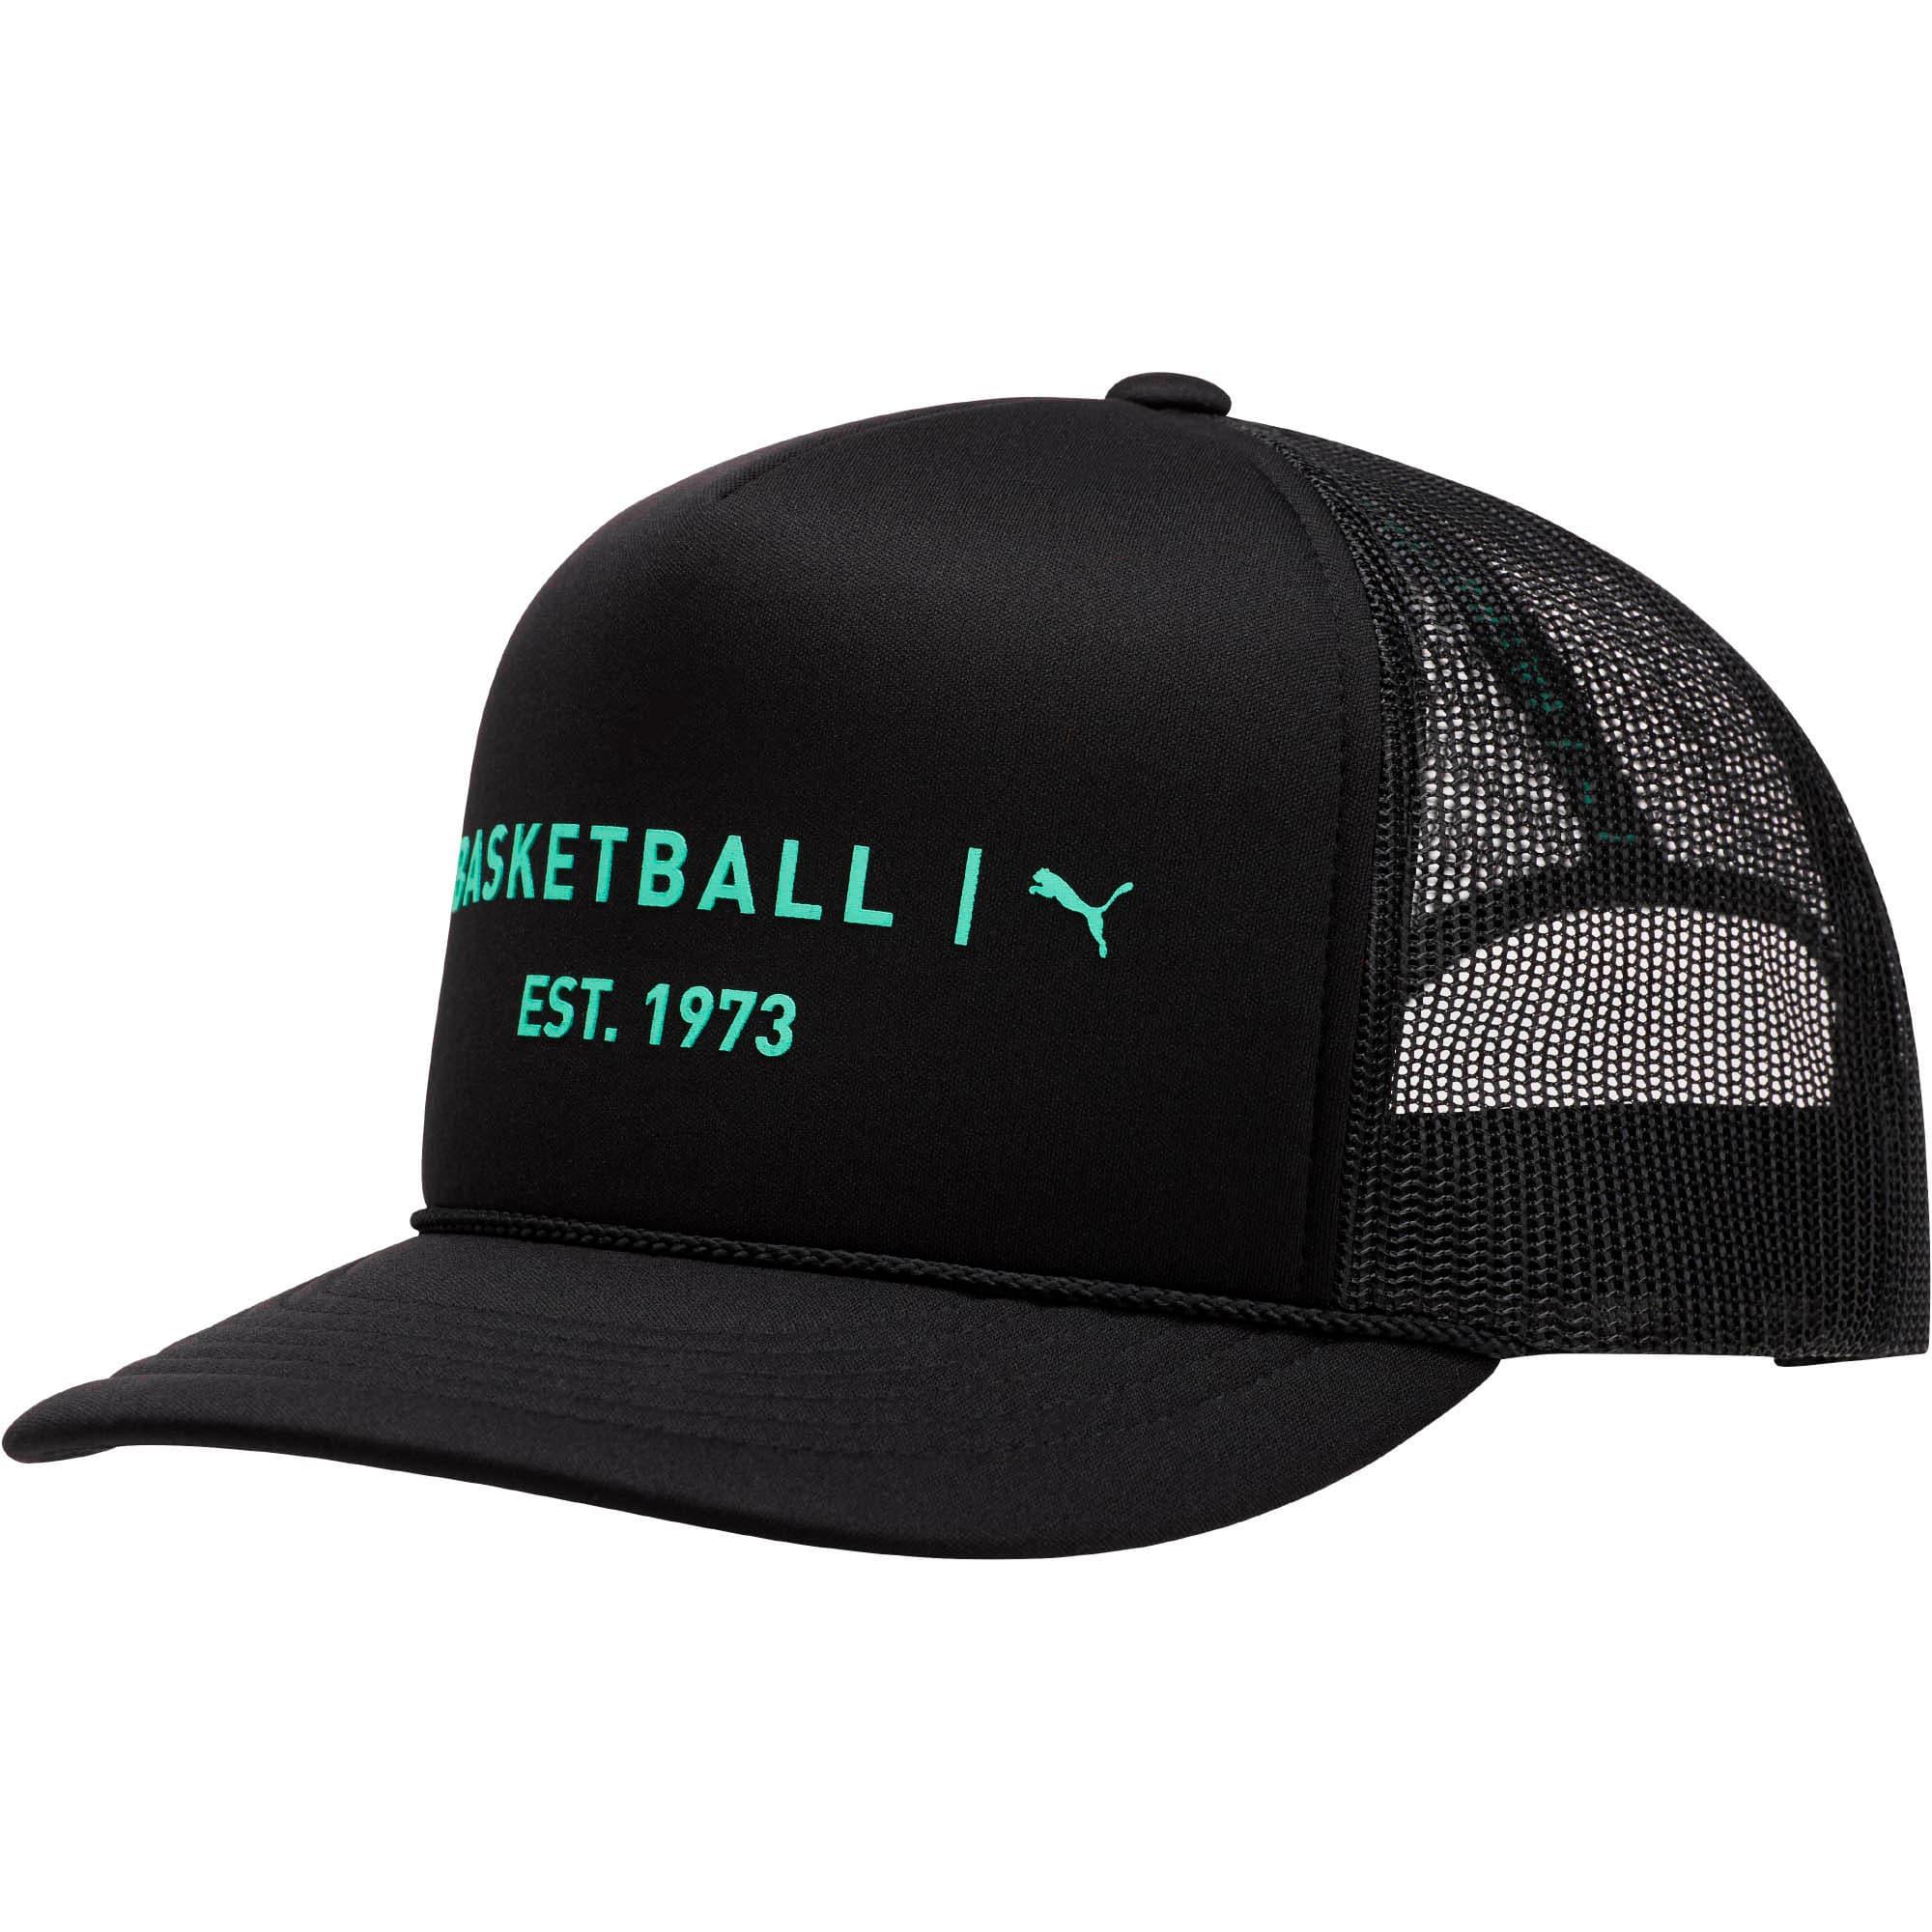 Thumbnail 1 of Core Mesh Trucker Hat, BLACK/GREEN, medium